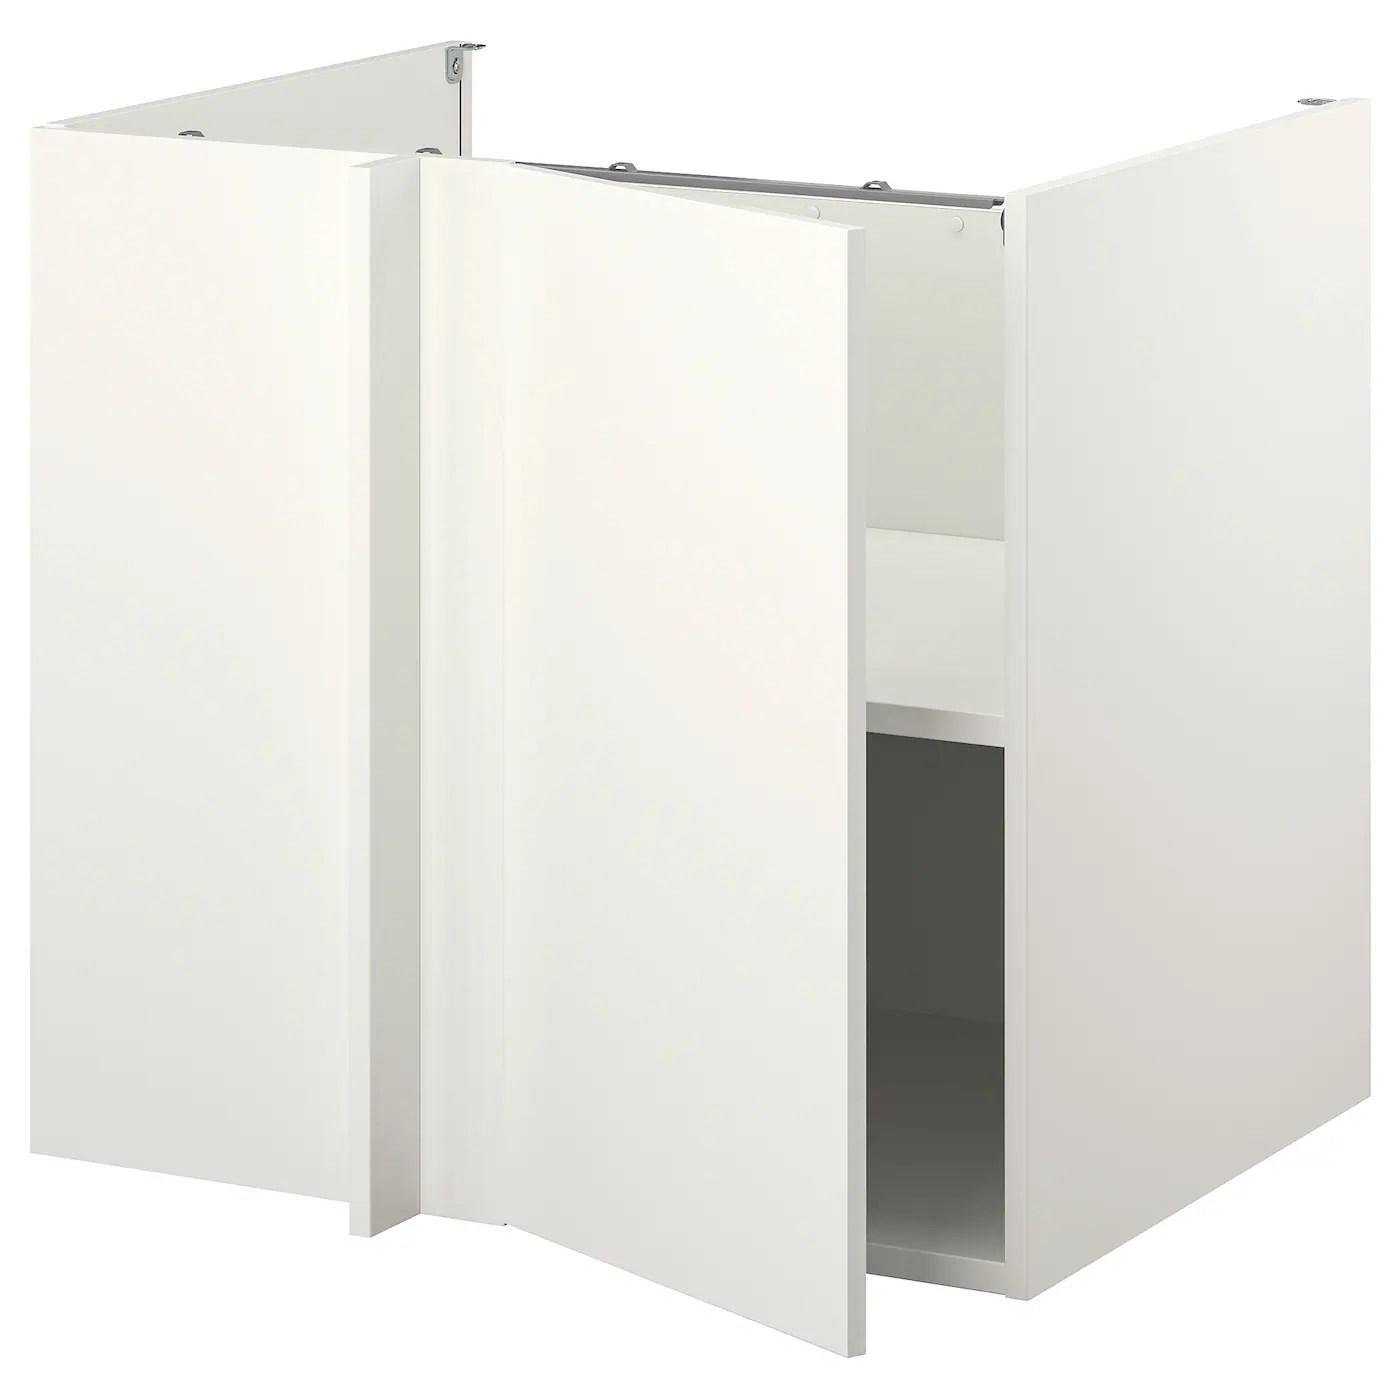 enhet element bas d angle blanc blanc 107x69x75 cm